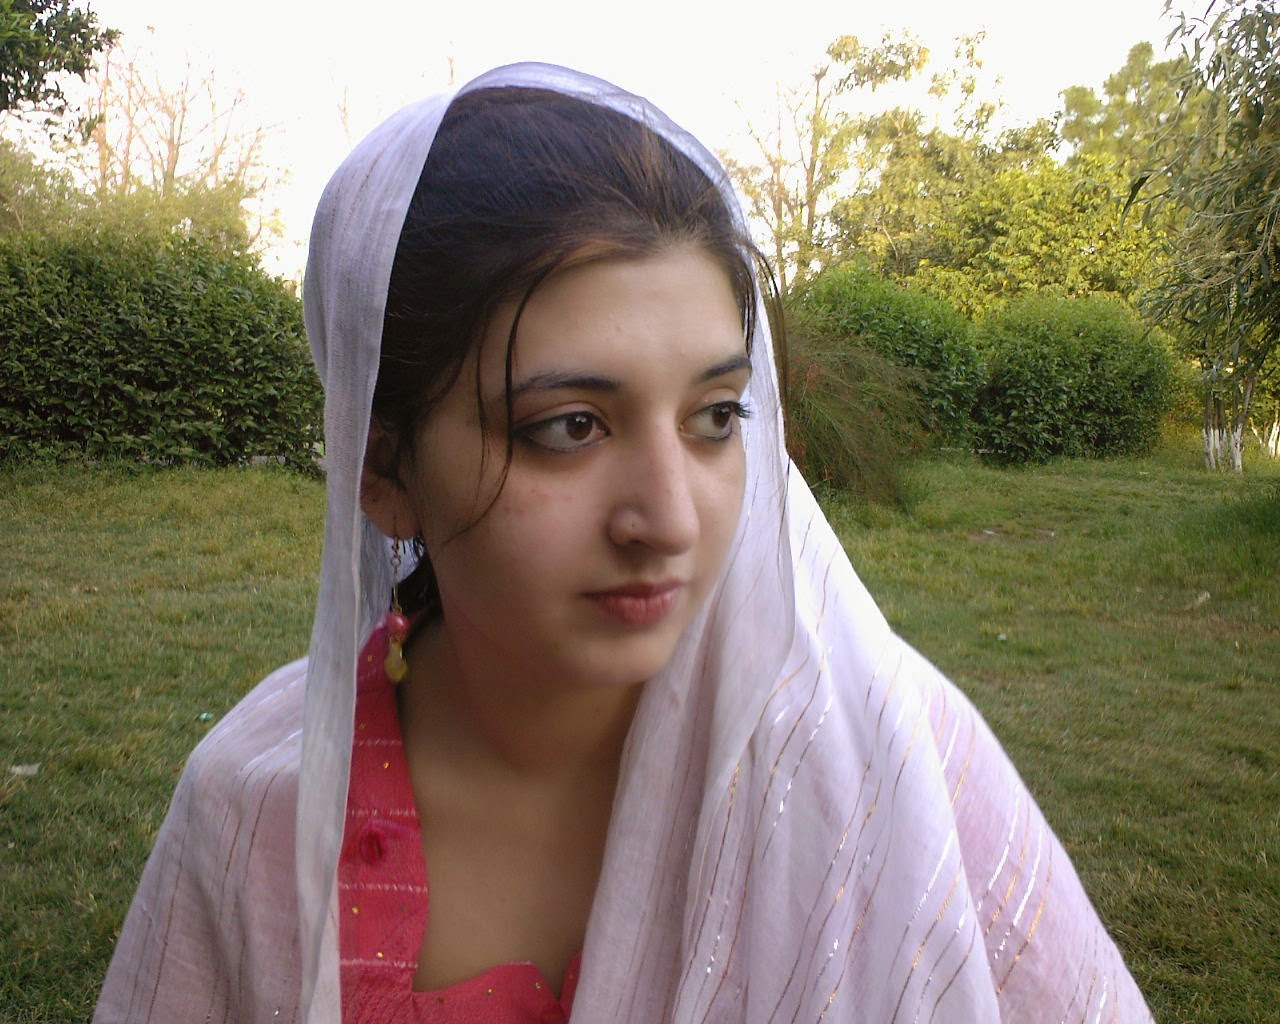 Indra gandhi nude pic